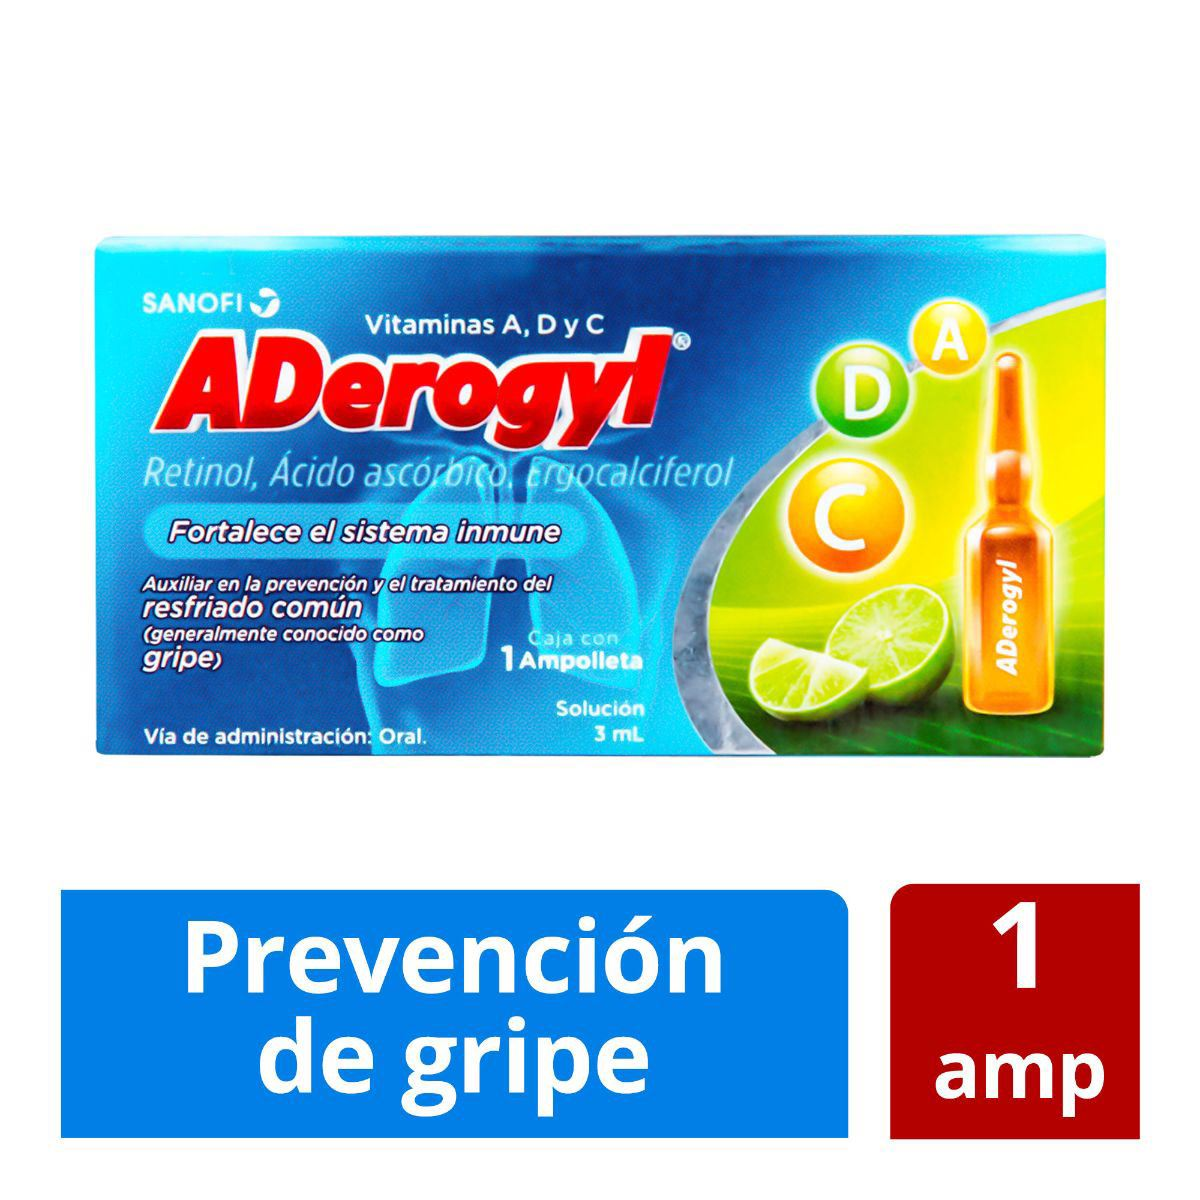 Aderogyl 15 con 1 ampolleta  - Sanborns